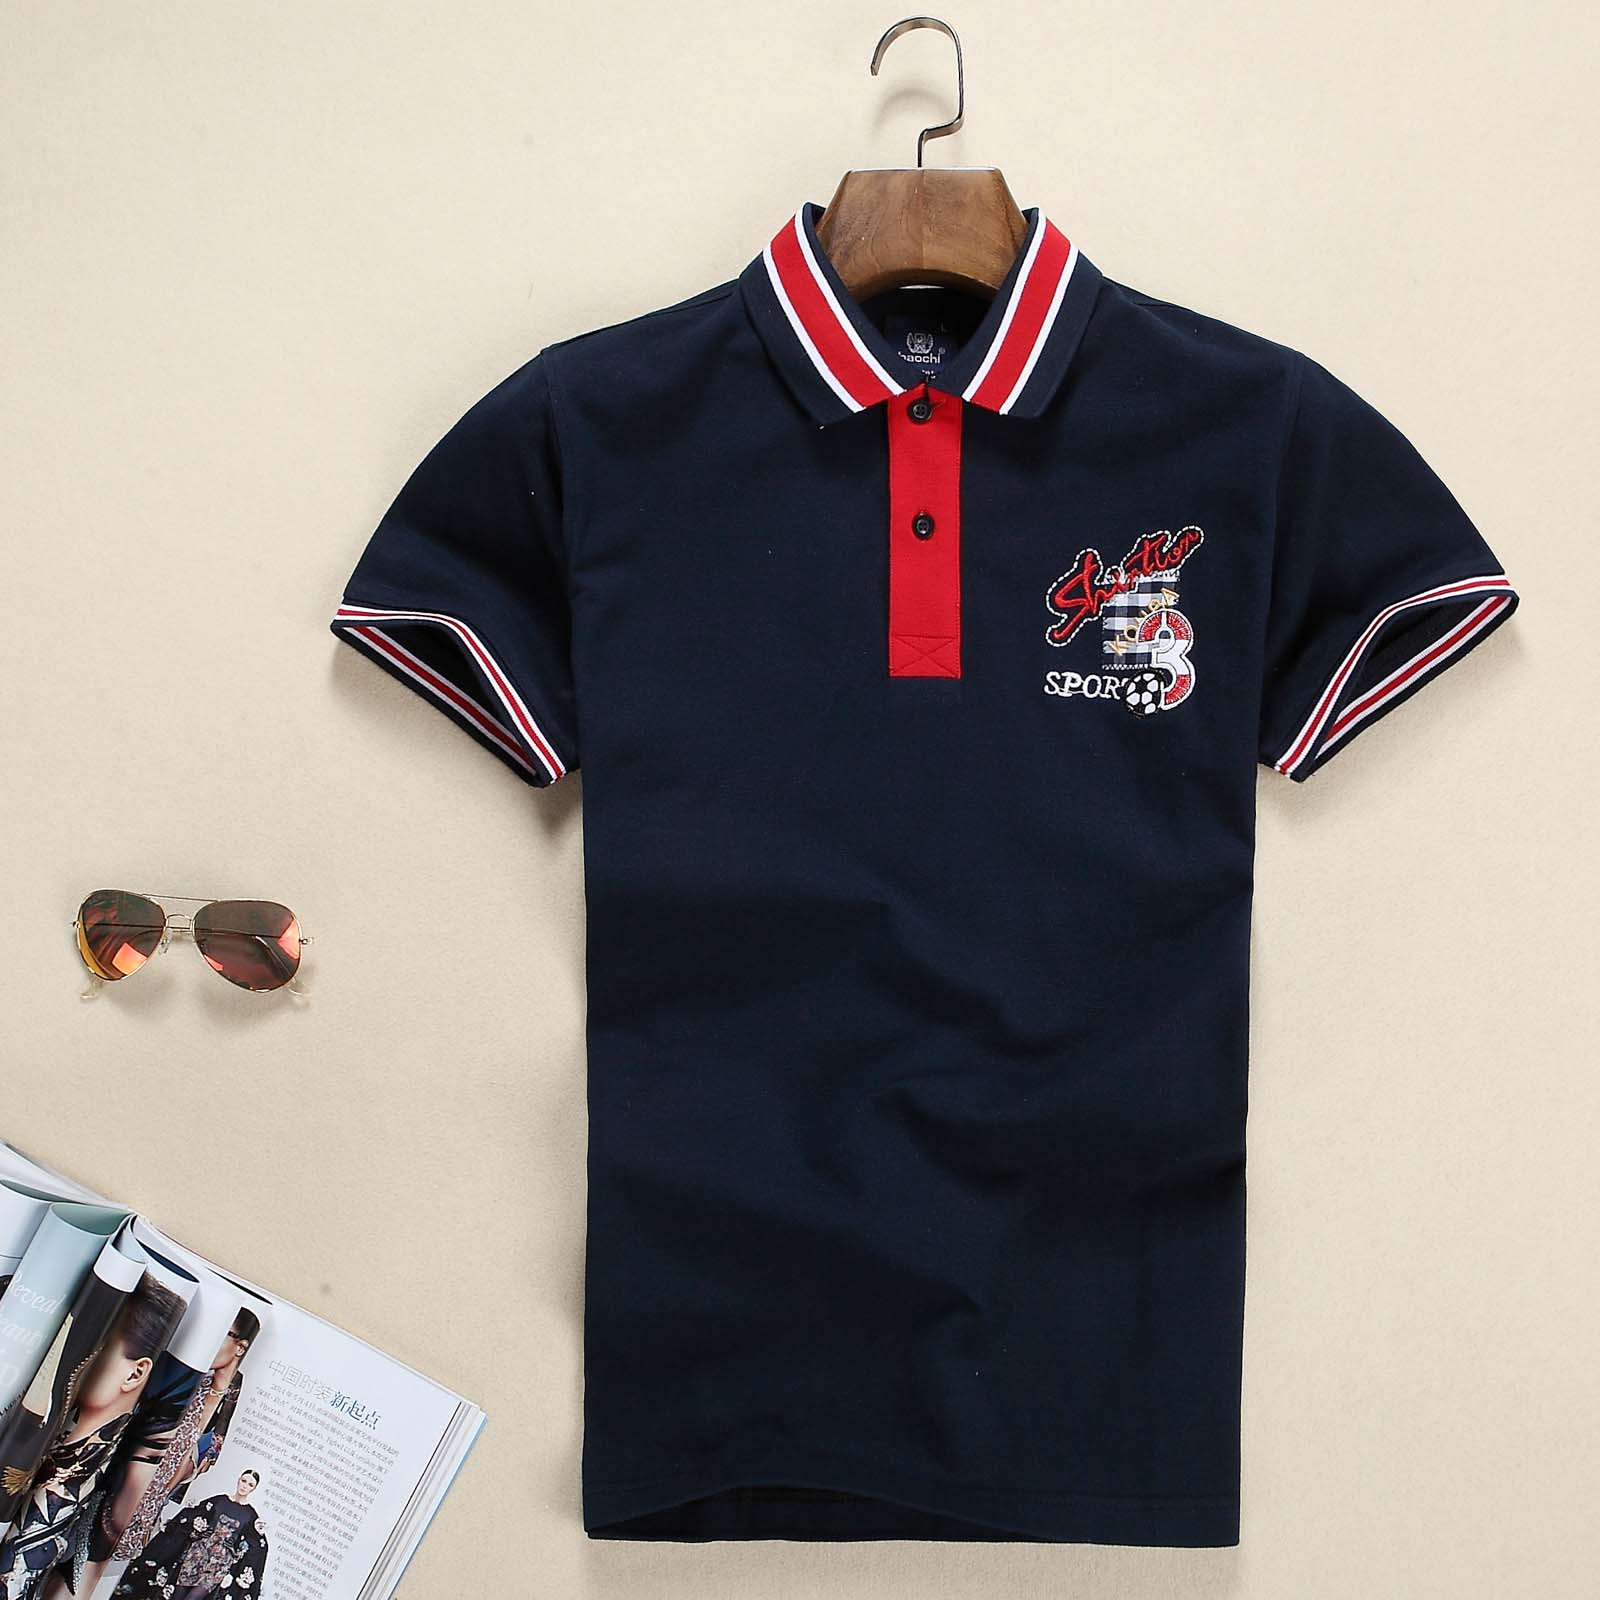 2015 New Brand Men's Polo Shirt Cotton Short Sleeve Shirt Sports Jerseys Golf Tennis Men Summer Tee Tops Camisa Polo Masculina(China (Mainland))